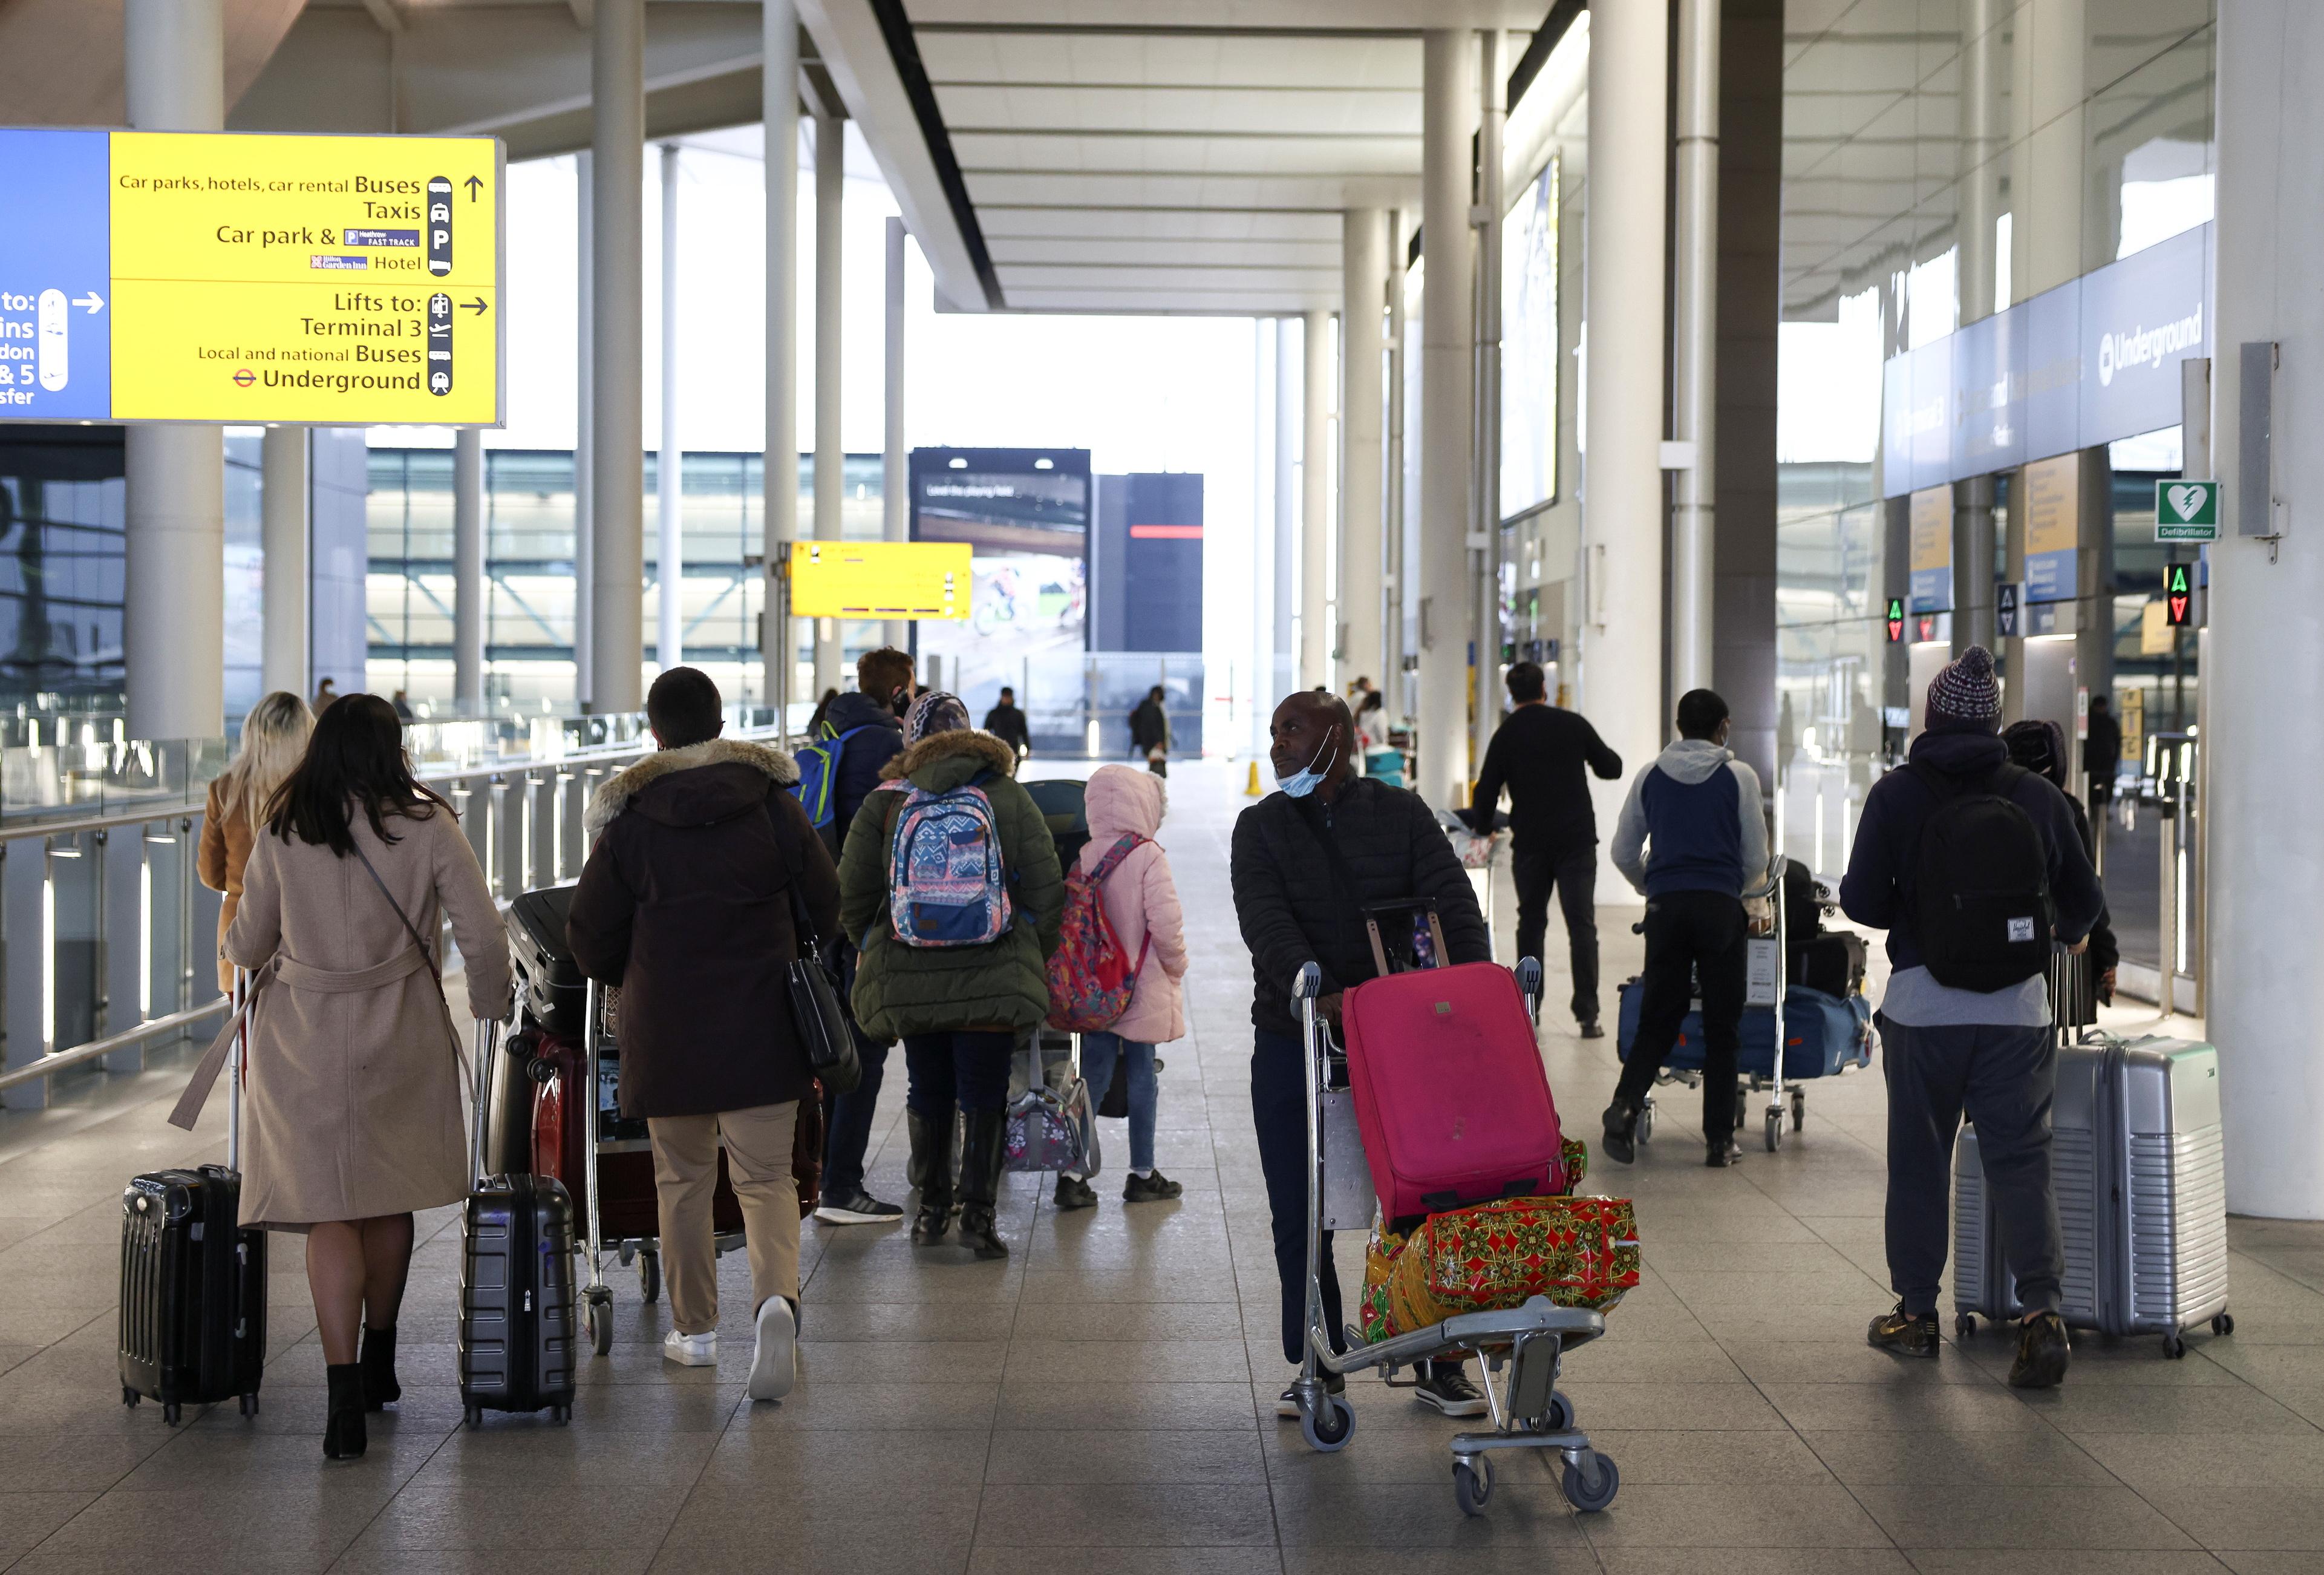 Travellers walk through Terminal 2 at Heathrow Airport, amid the coronavirus disease (COVID-19) outbreak in London, Britain February 14, 2021. REUTERS/Henry Nicholls